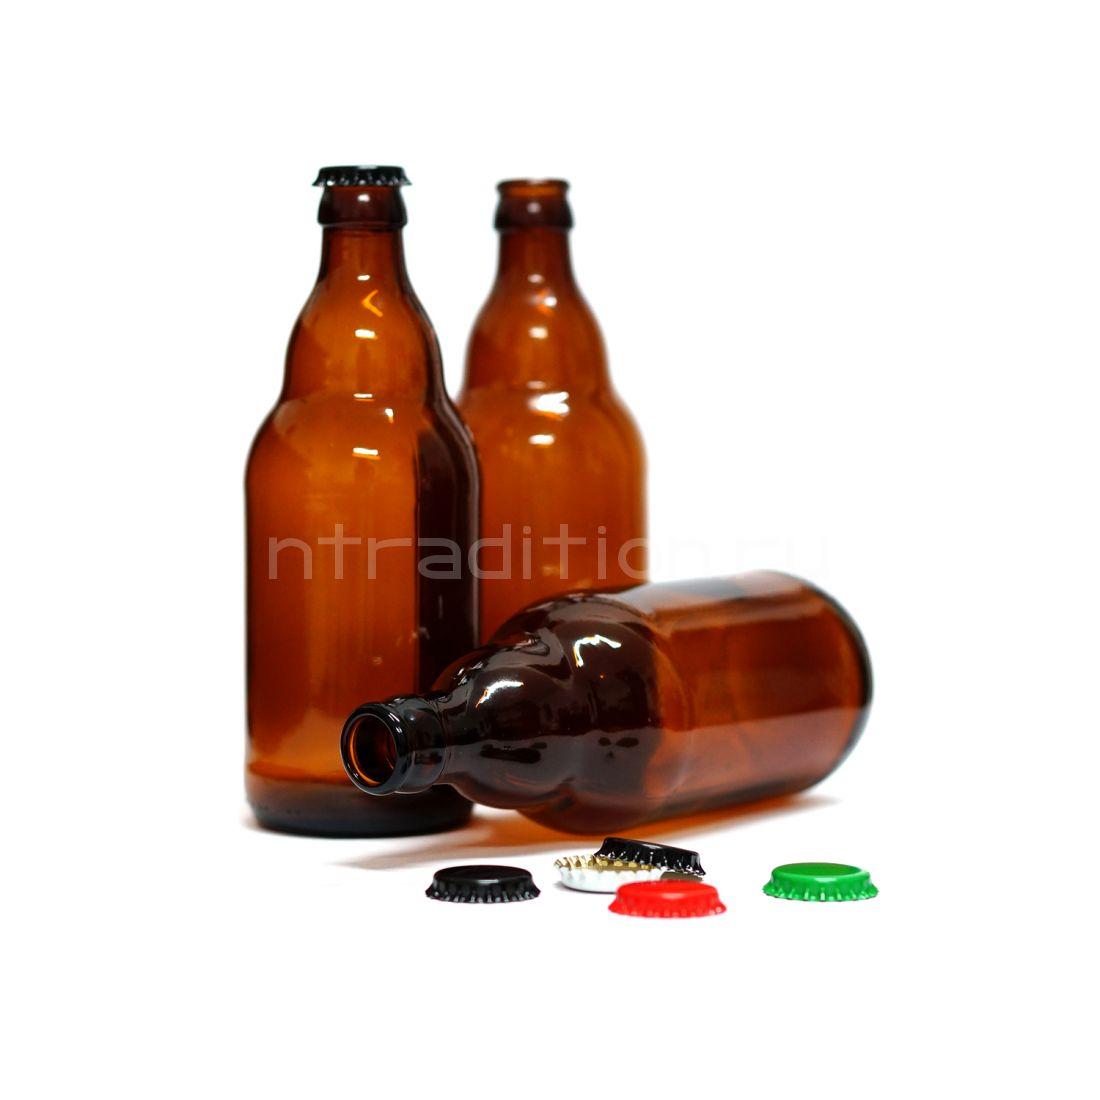 Бутылка под кронен пробку Стейни (Steinie) 0,5 л / 12 шт.